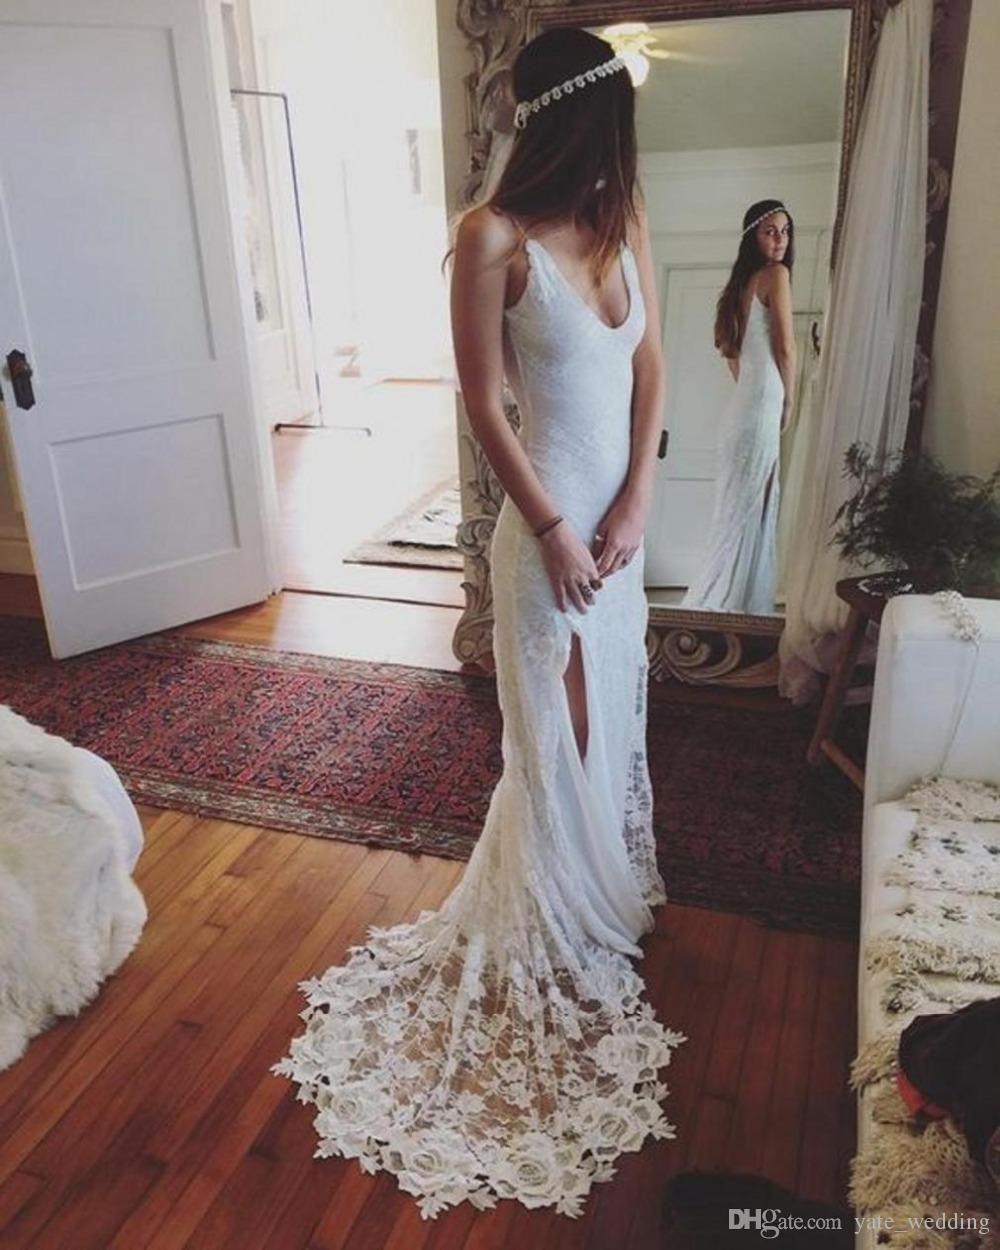 987ddd7407ed3 Lace Bohemian Wedding Dresses 2017 Sexy Deep V Neck Spagheti Straps High  Split Backless Wedding Gowns